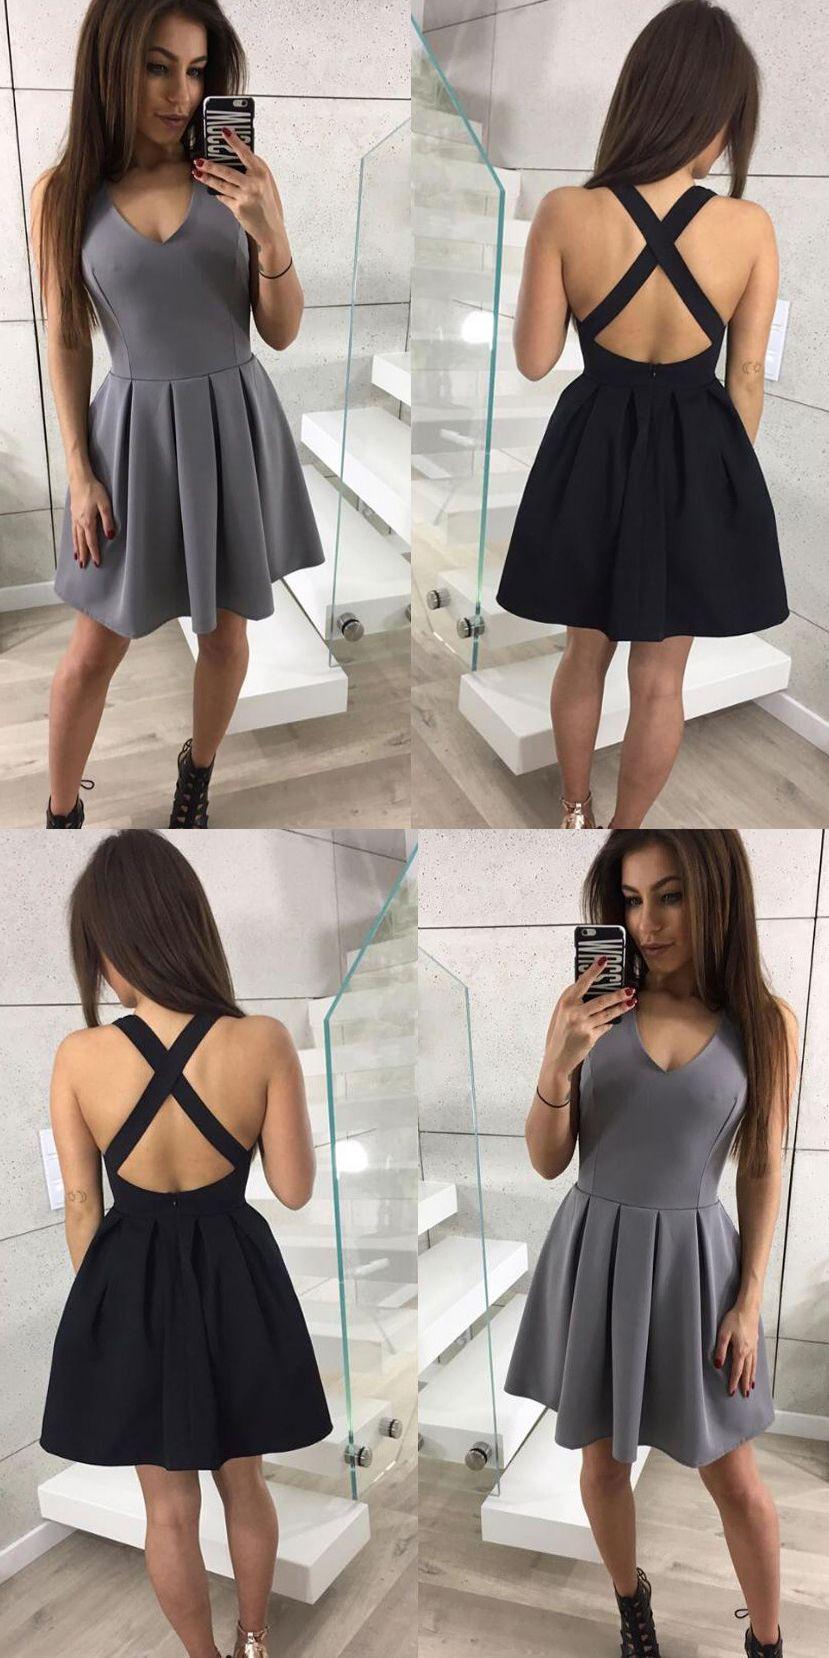 Sexy black short prom dressesfashion criss cross back homecoming